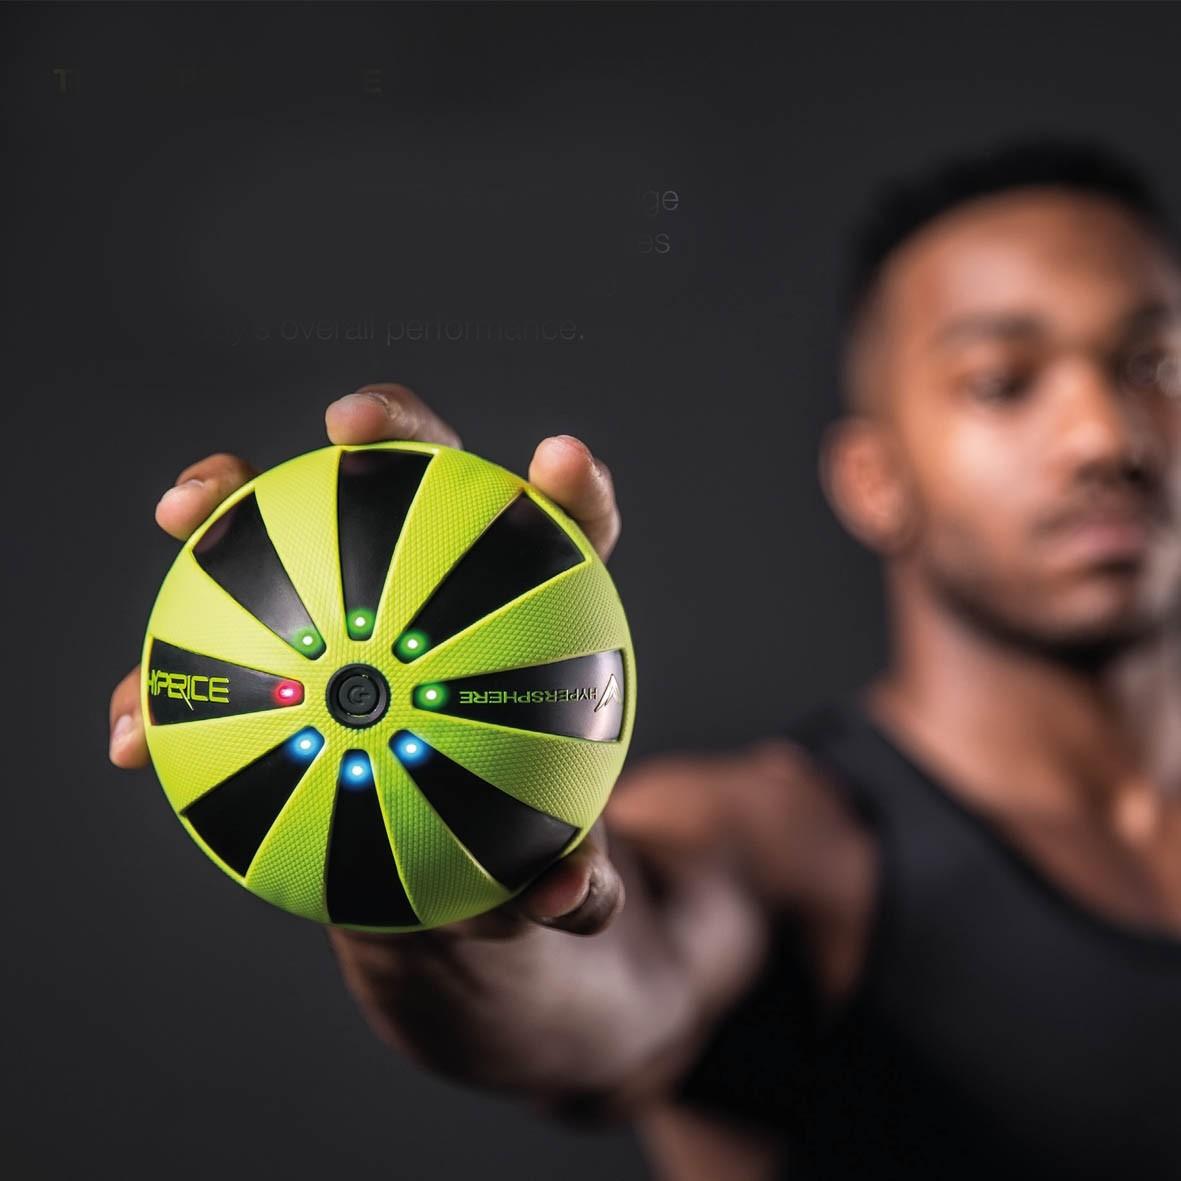 Hyperice - Hypersphere schwarz/grün